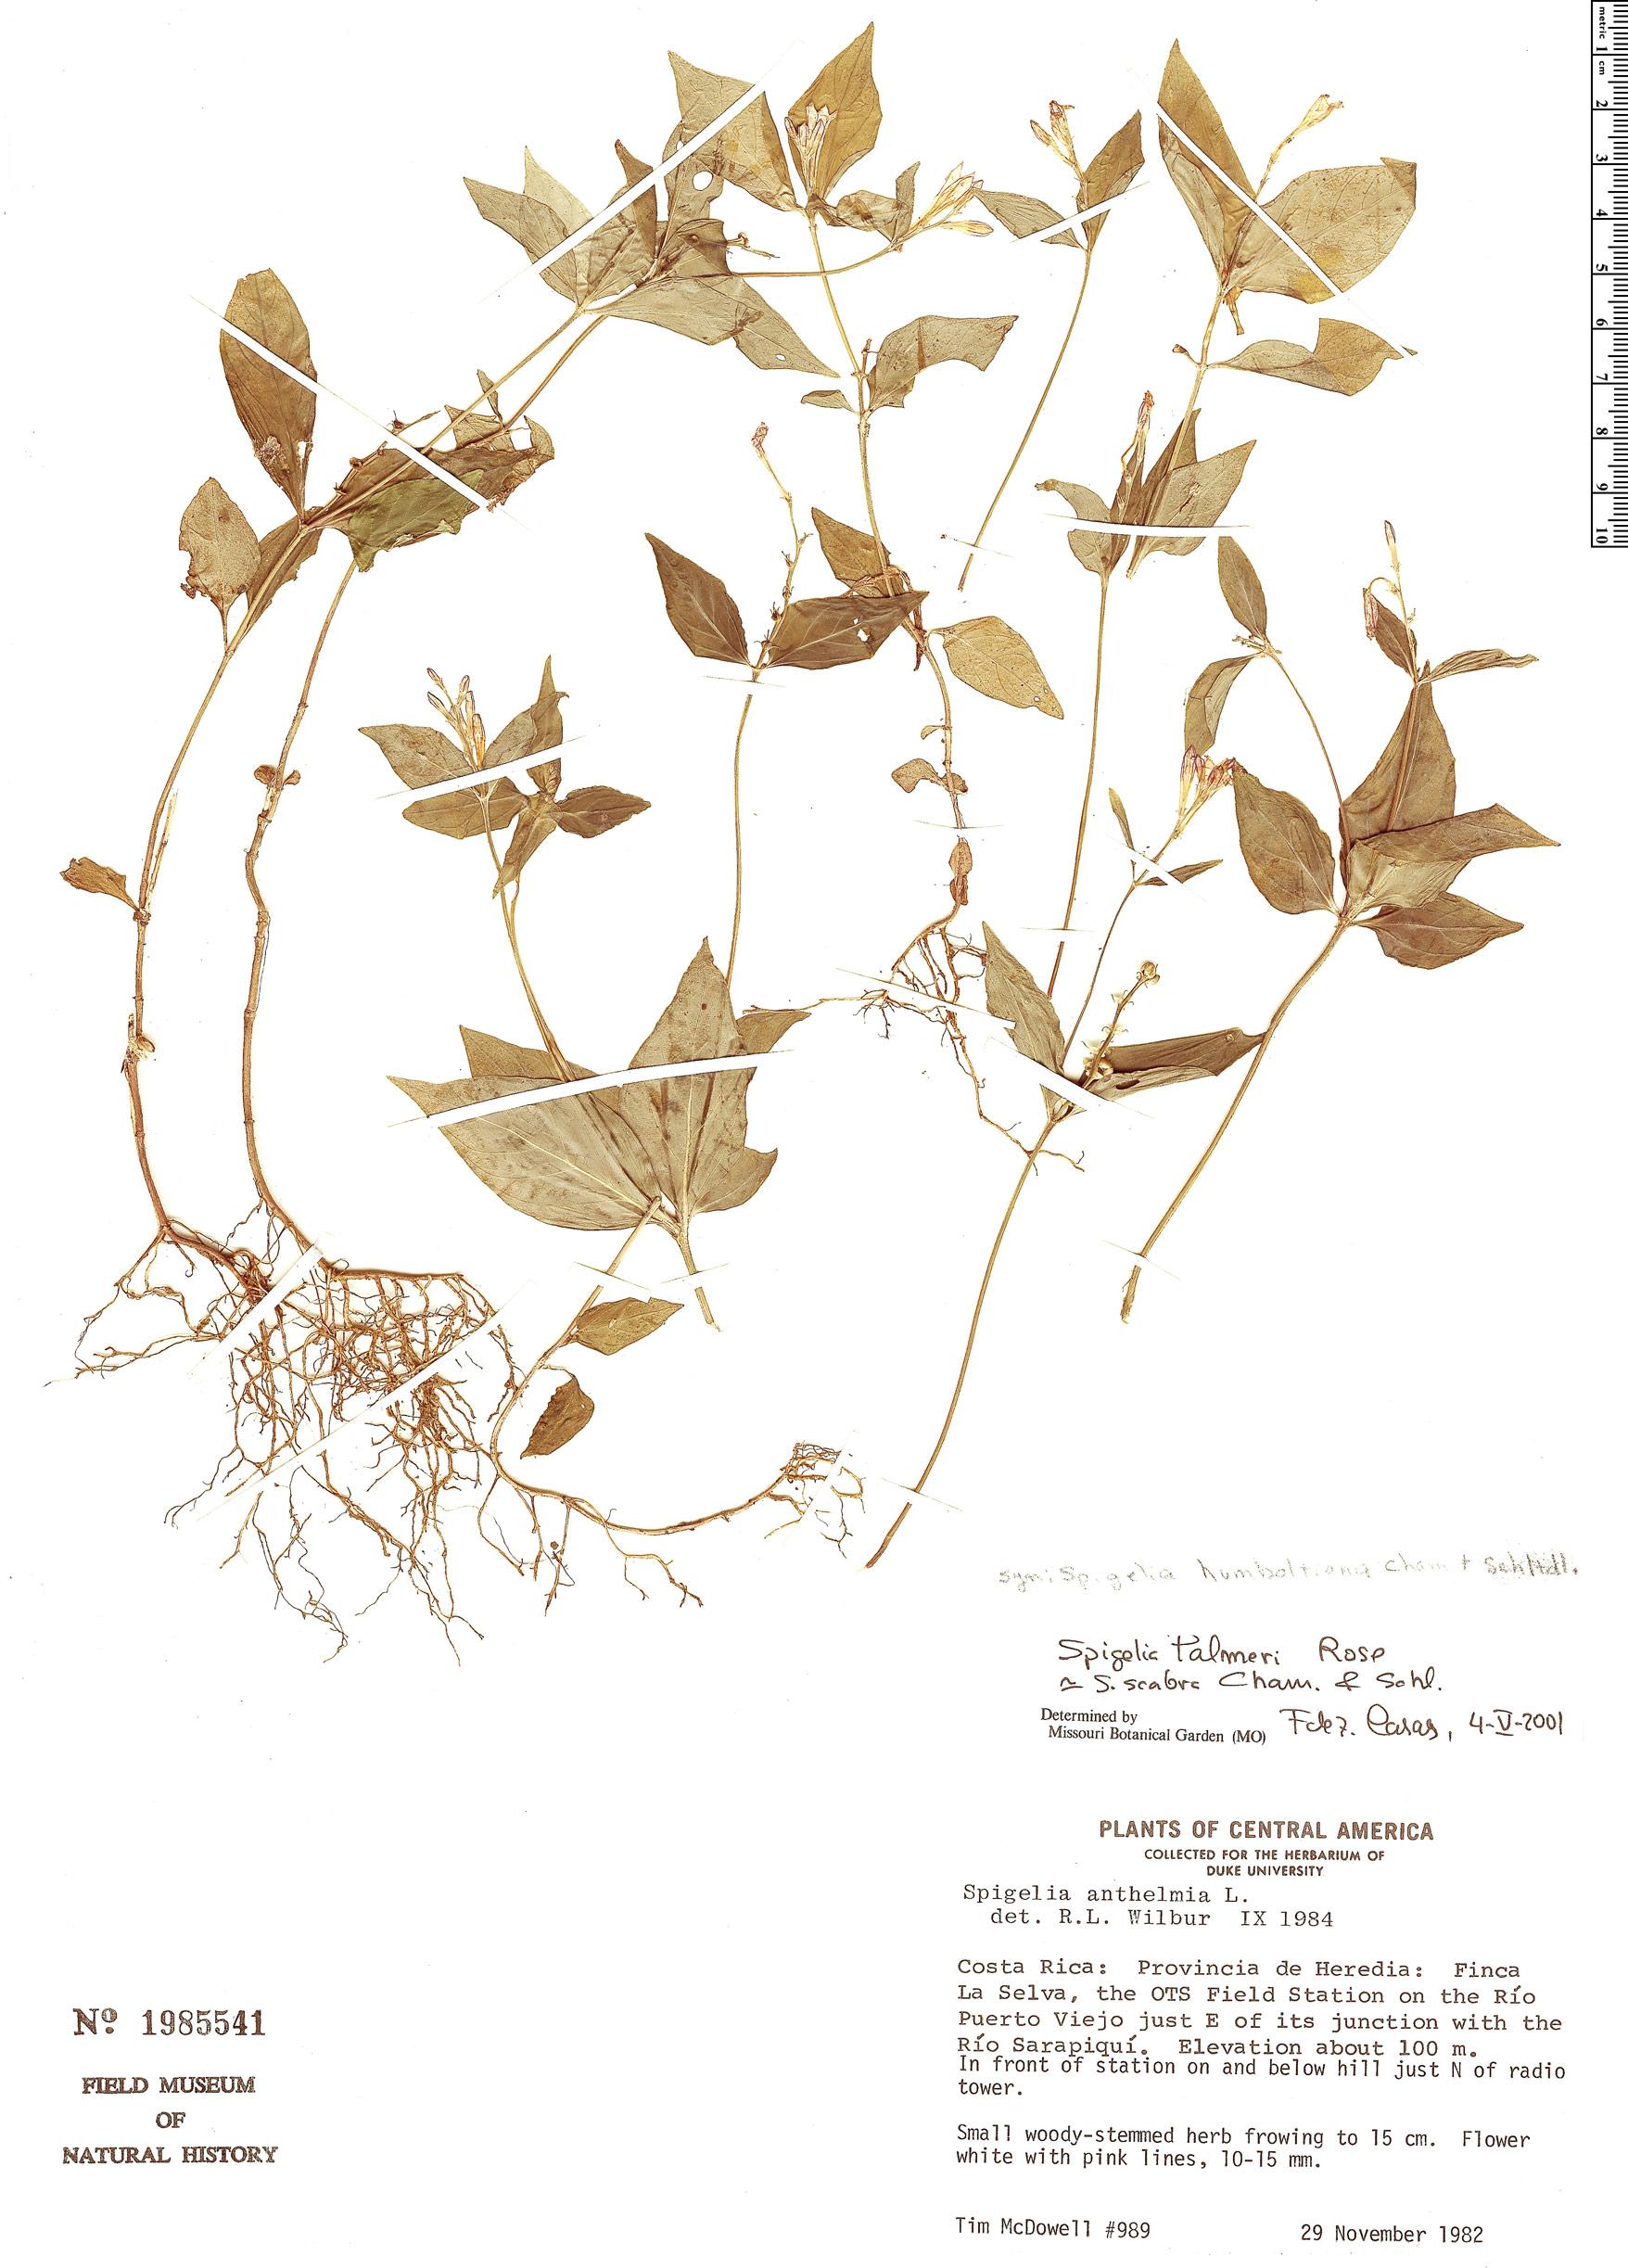 Specimen: Spigelia humboldtiana